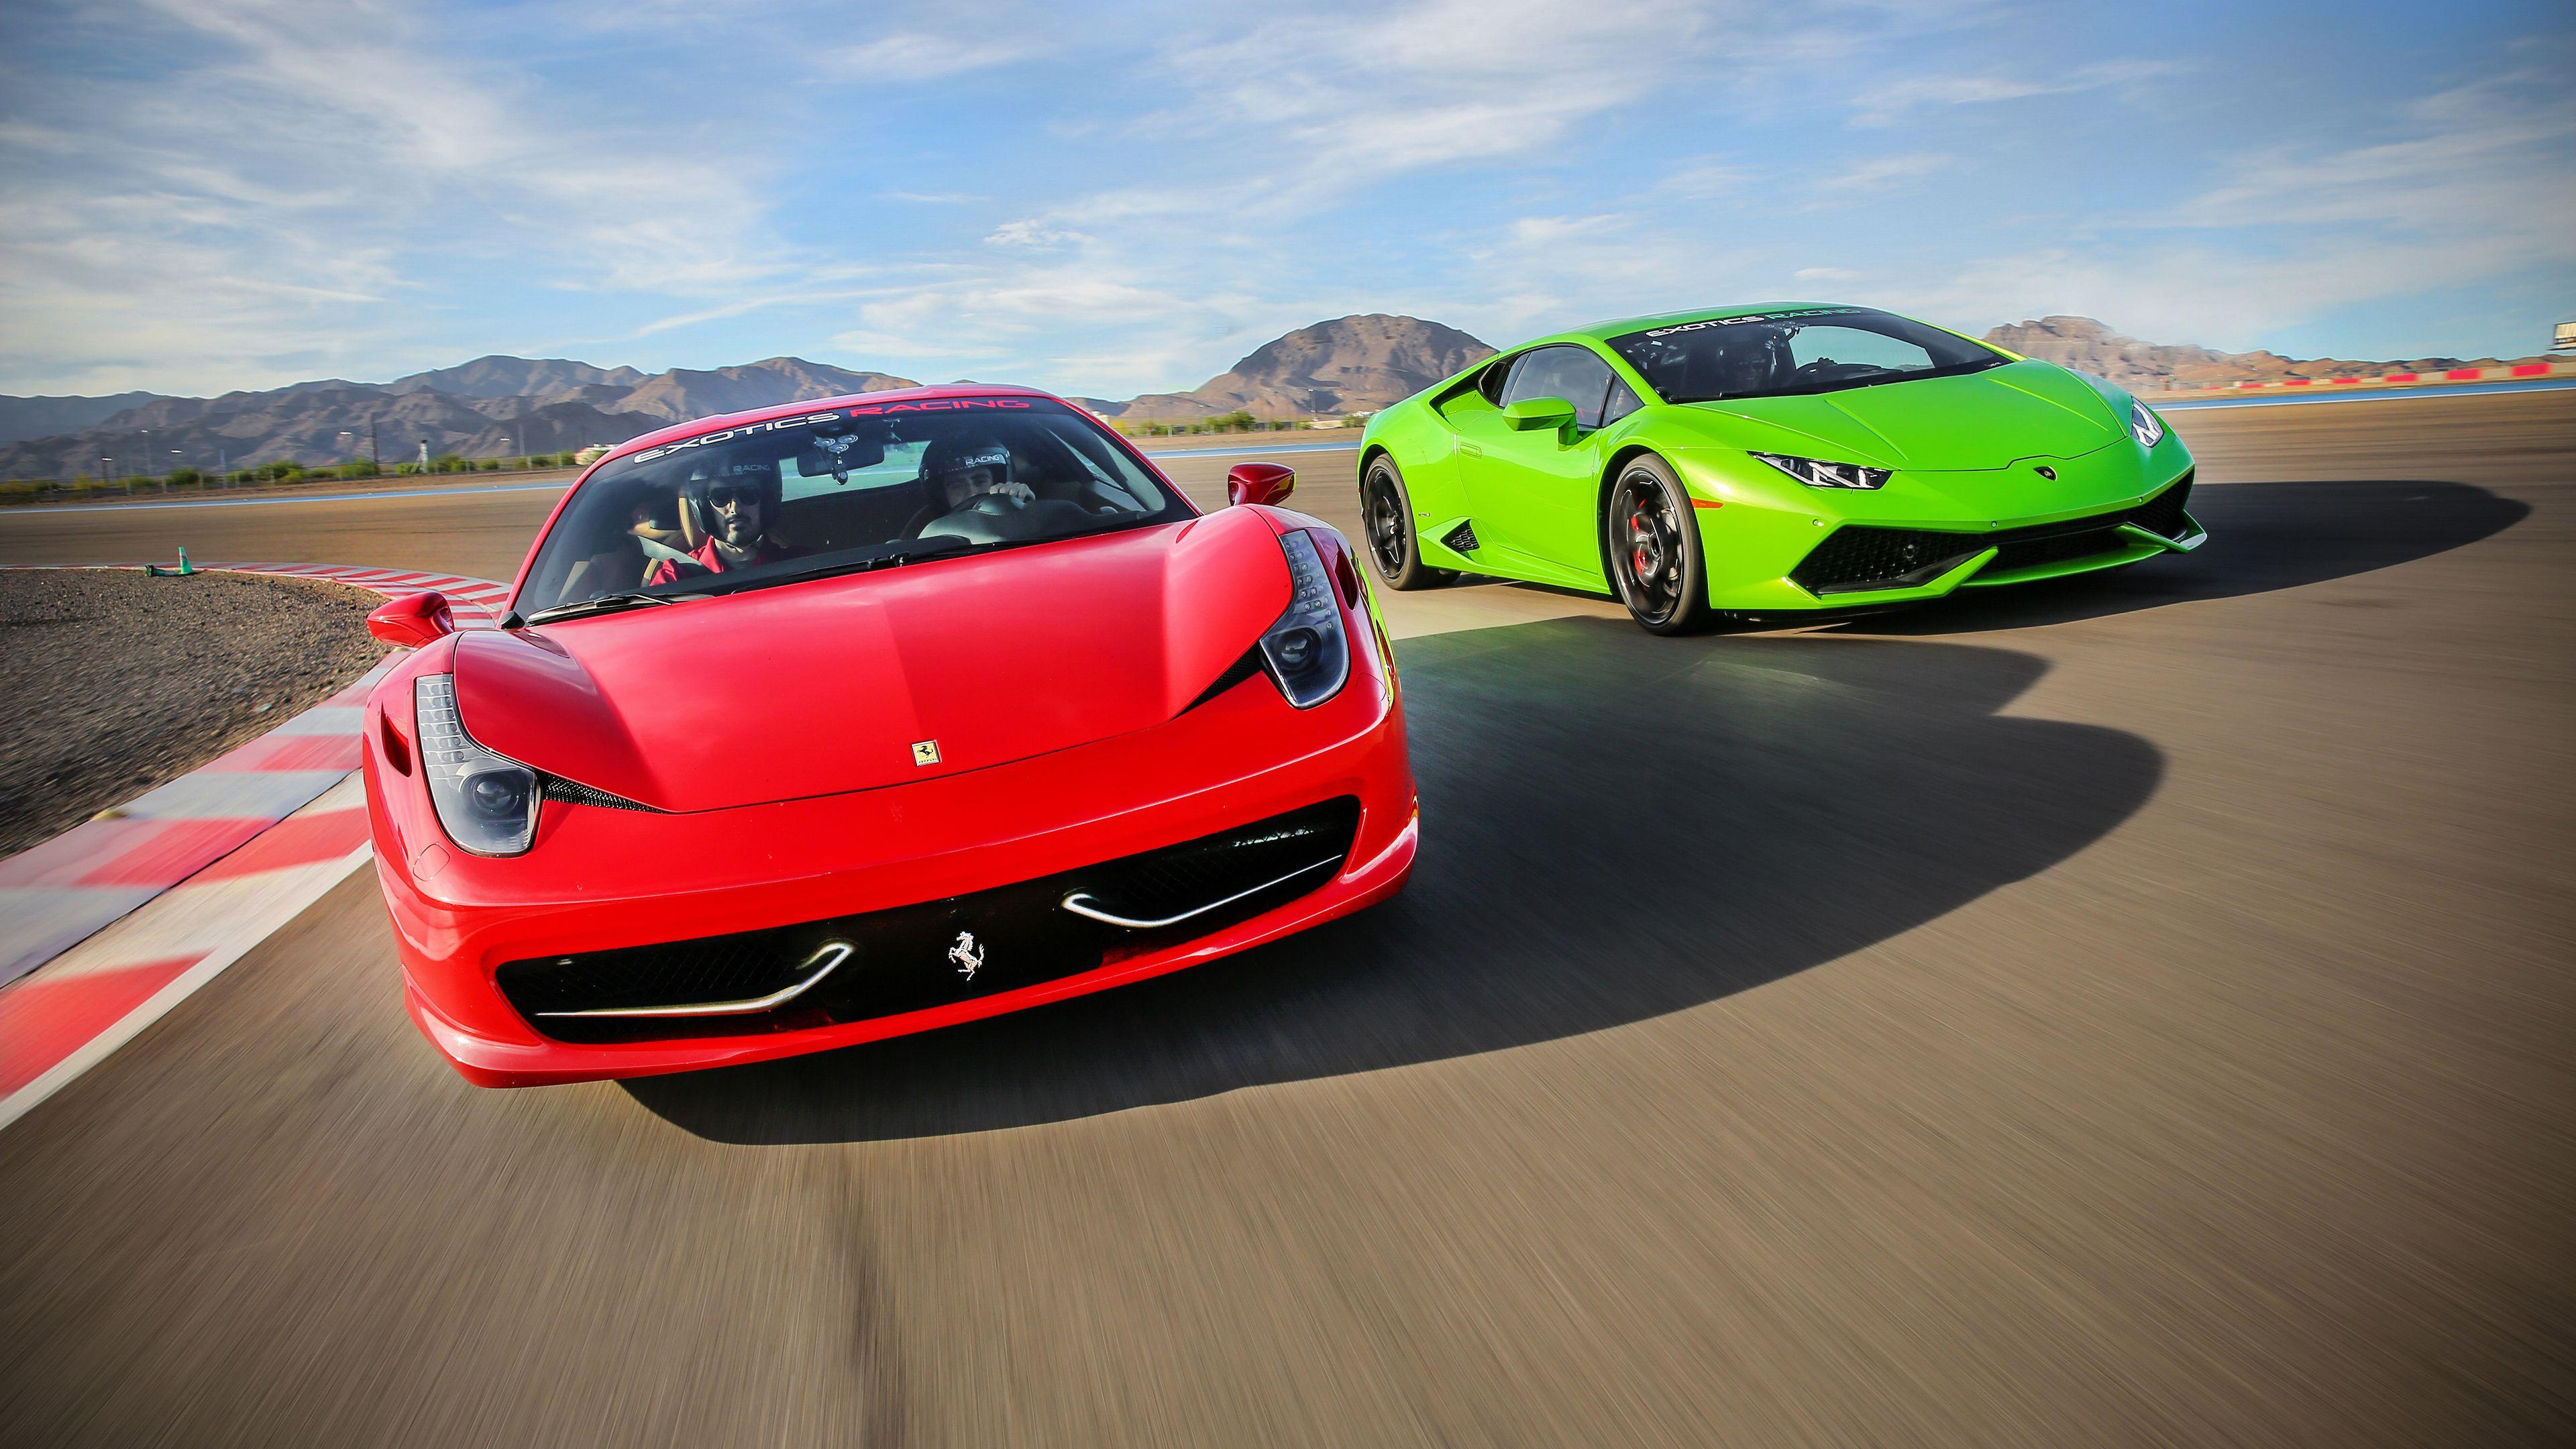 Ferrari Italia and Lamborghini Huracan race around the exotics racing course